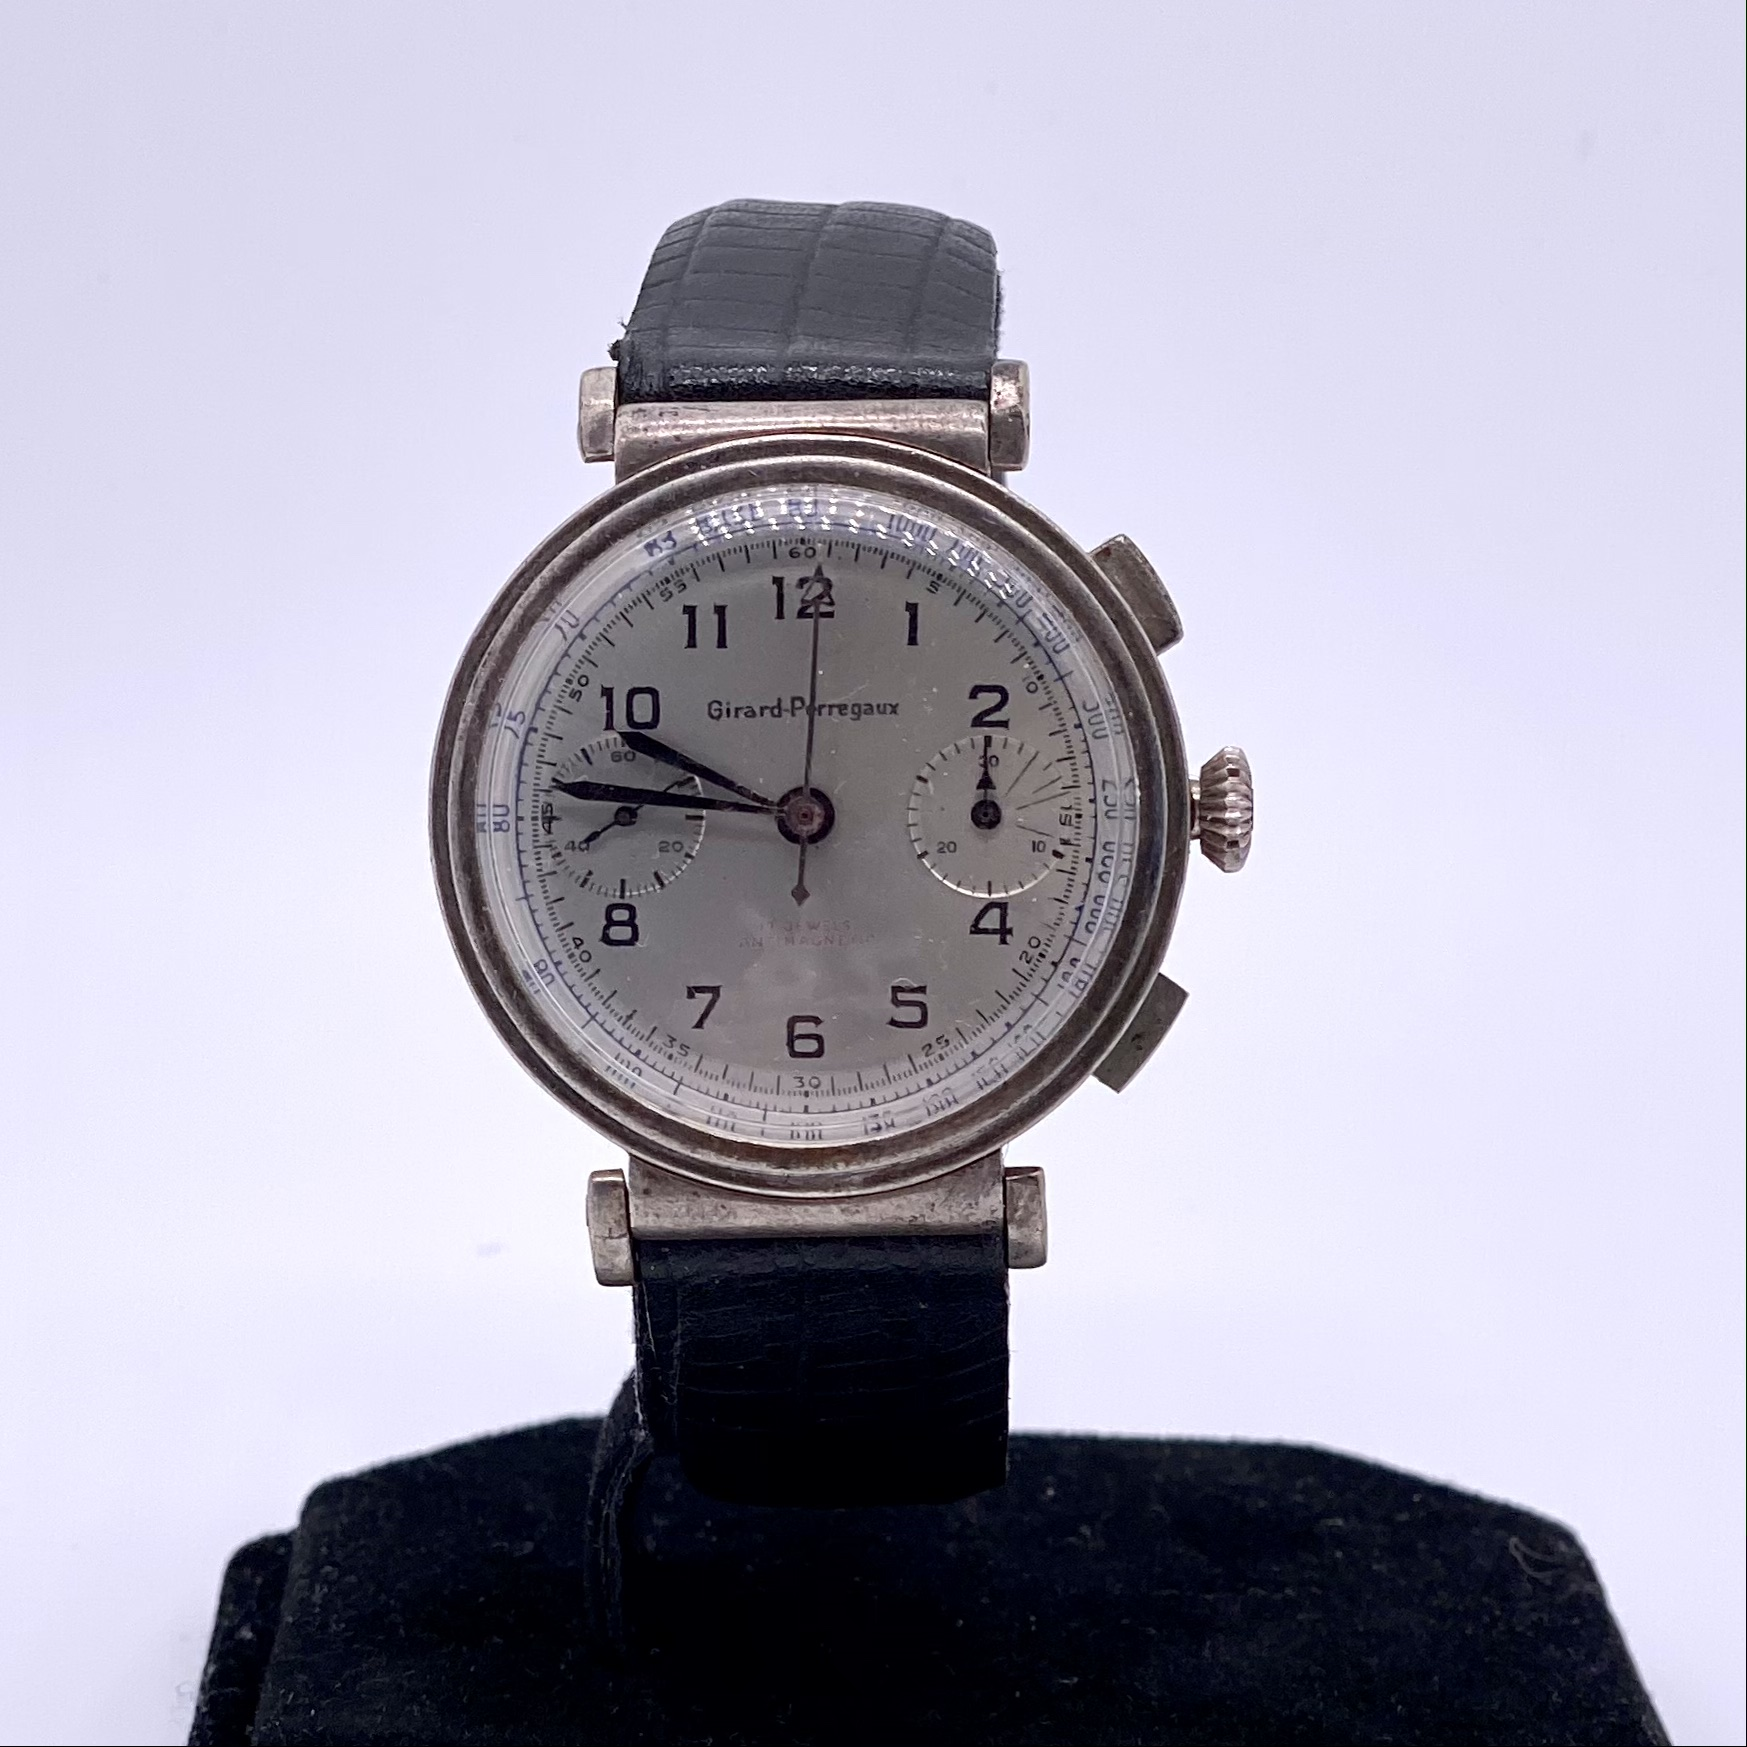 Girard Perregaux Vintage Chronograph